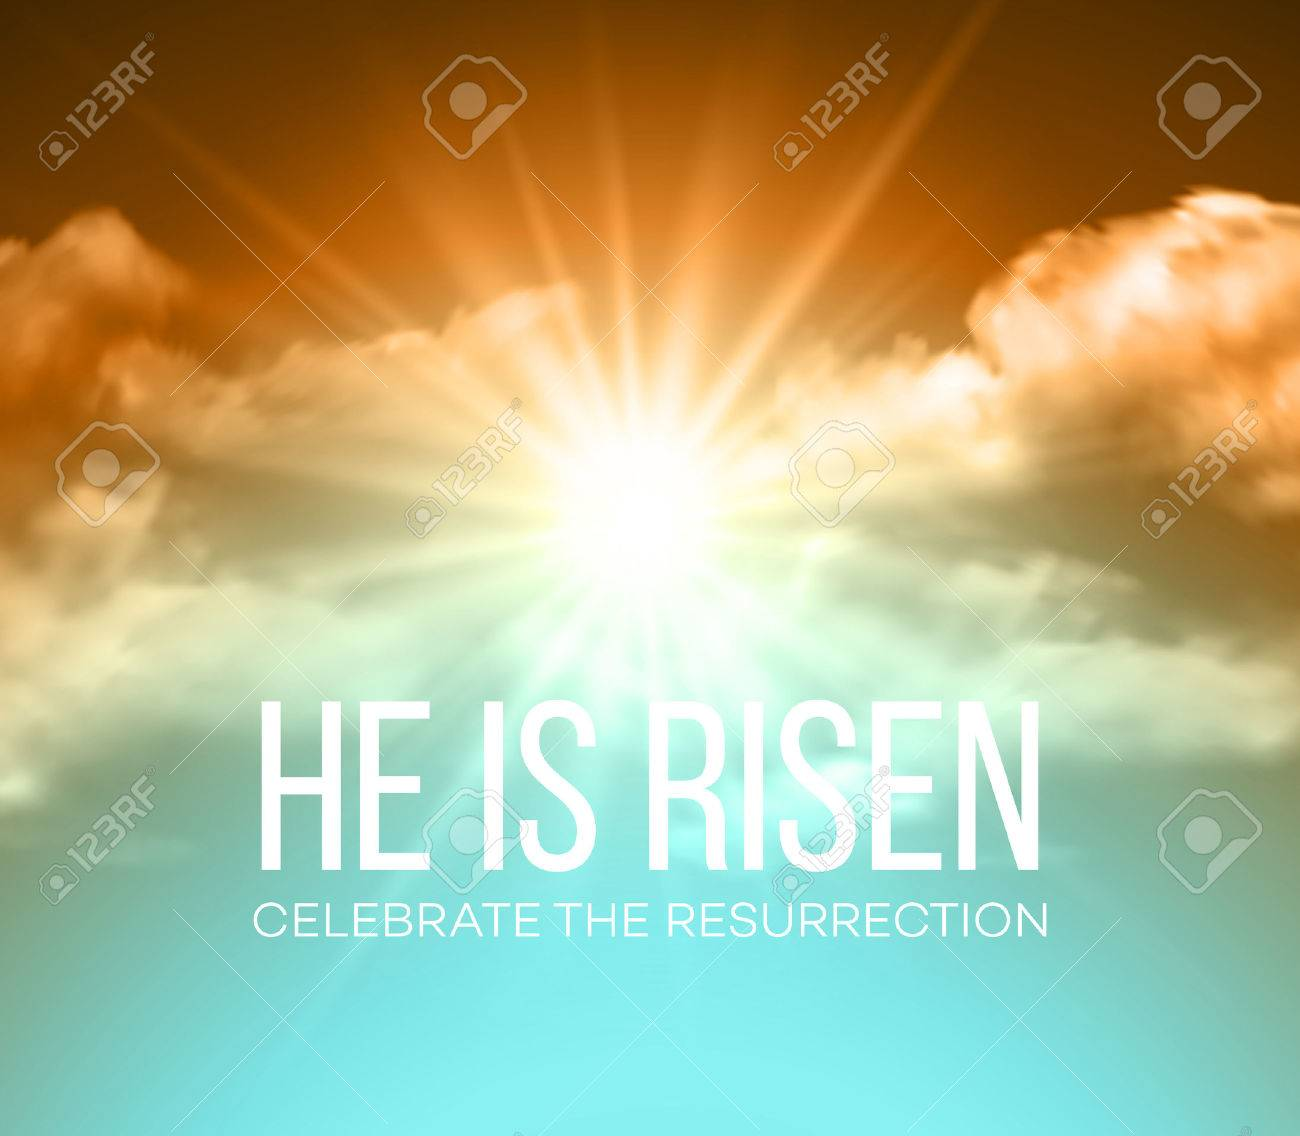 He is risen. Easter background. Vector illustration EPS10 - 52029045